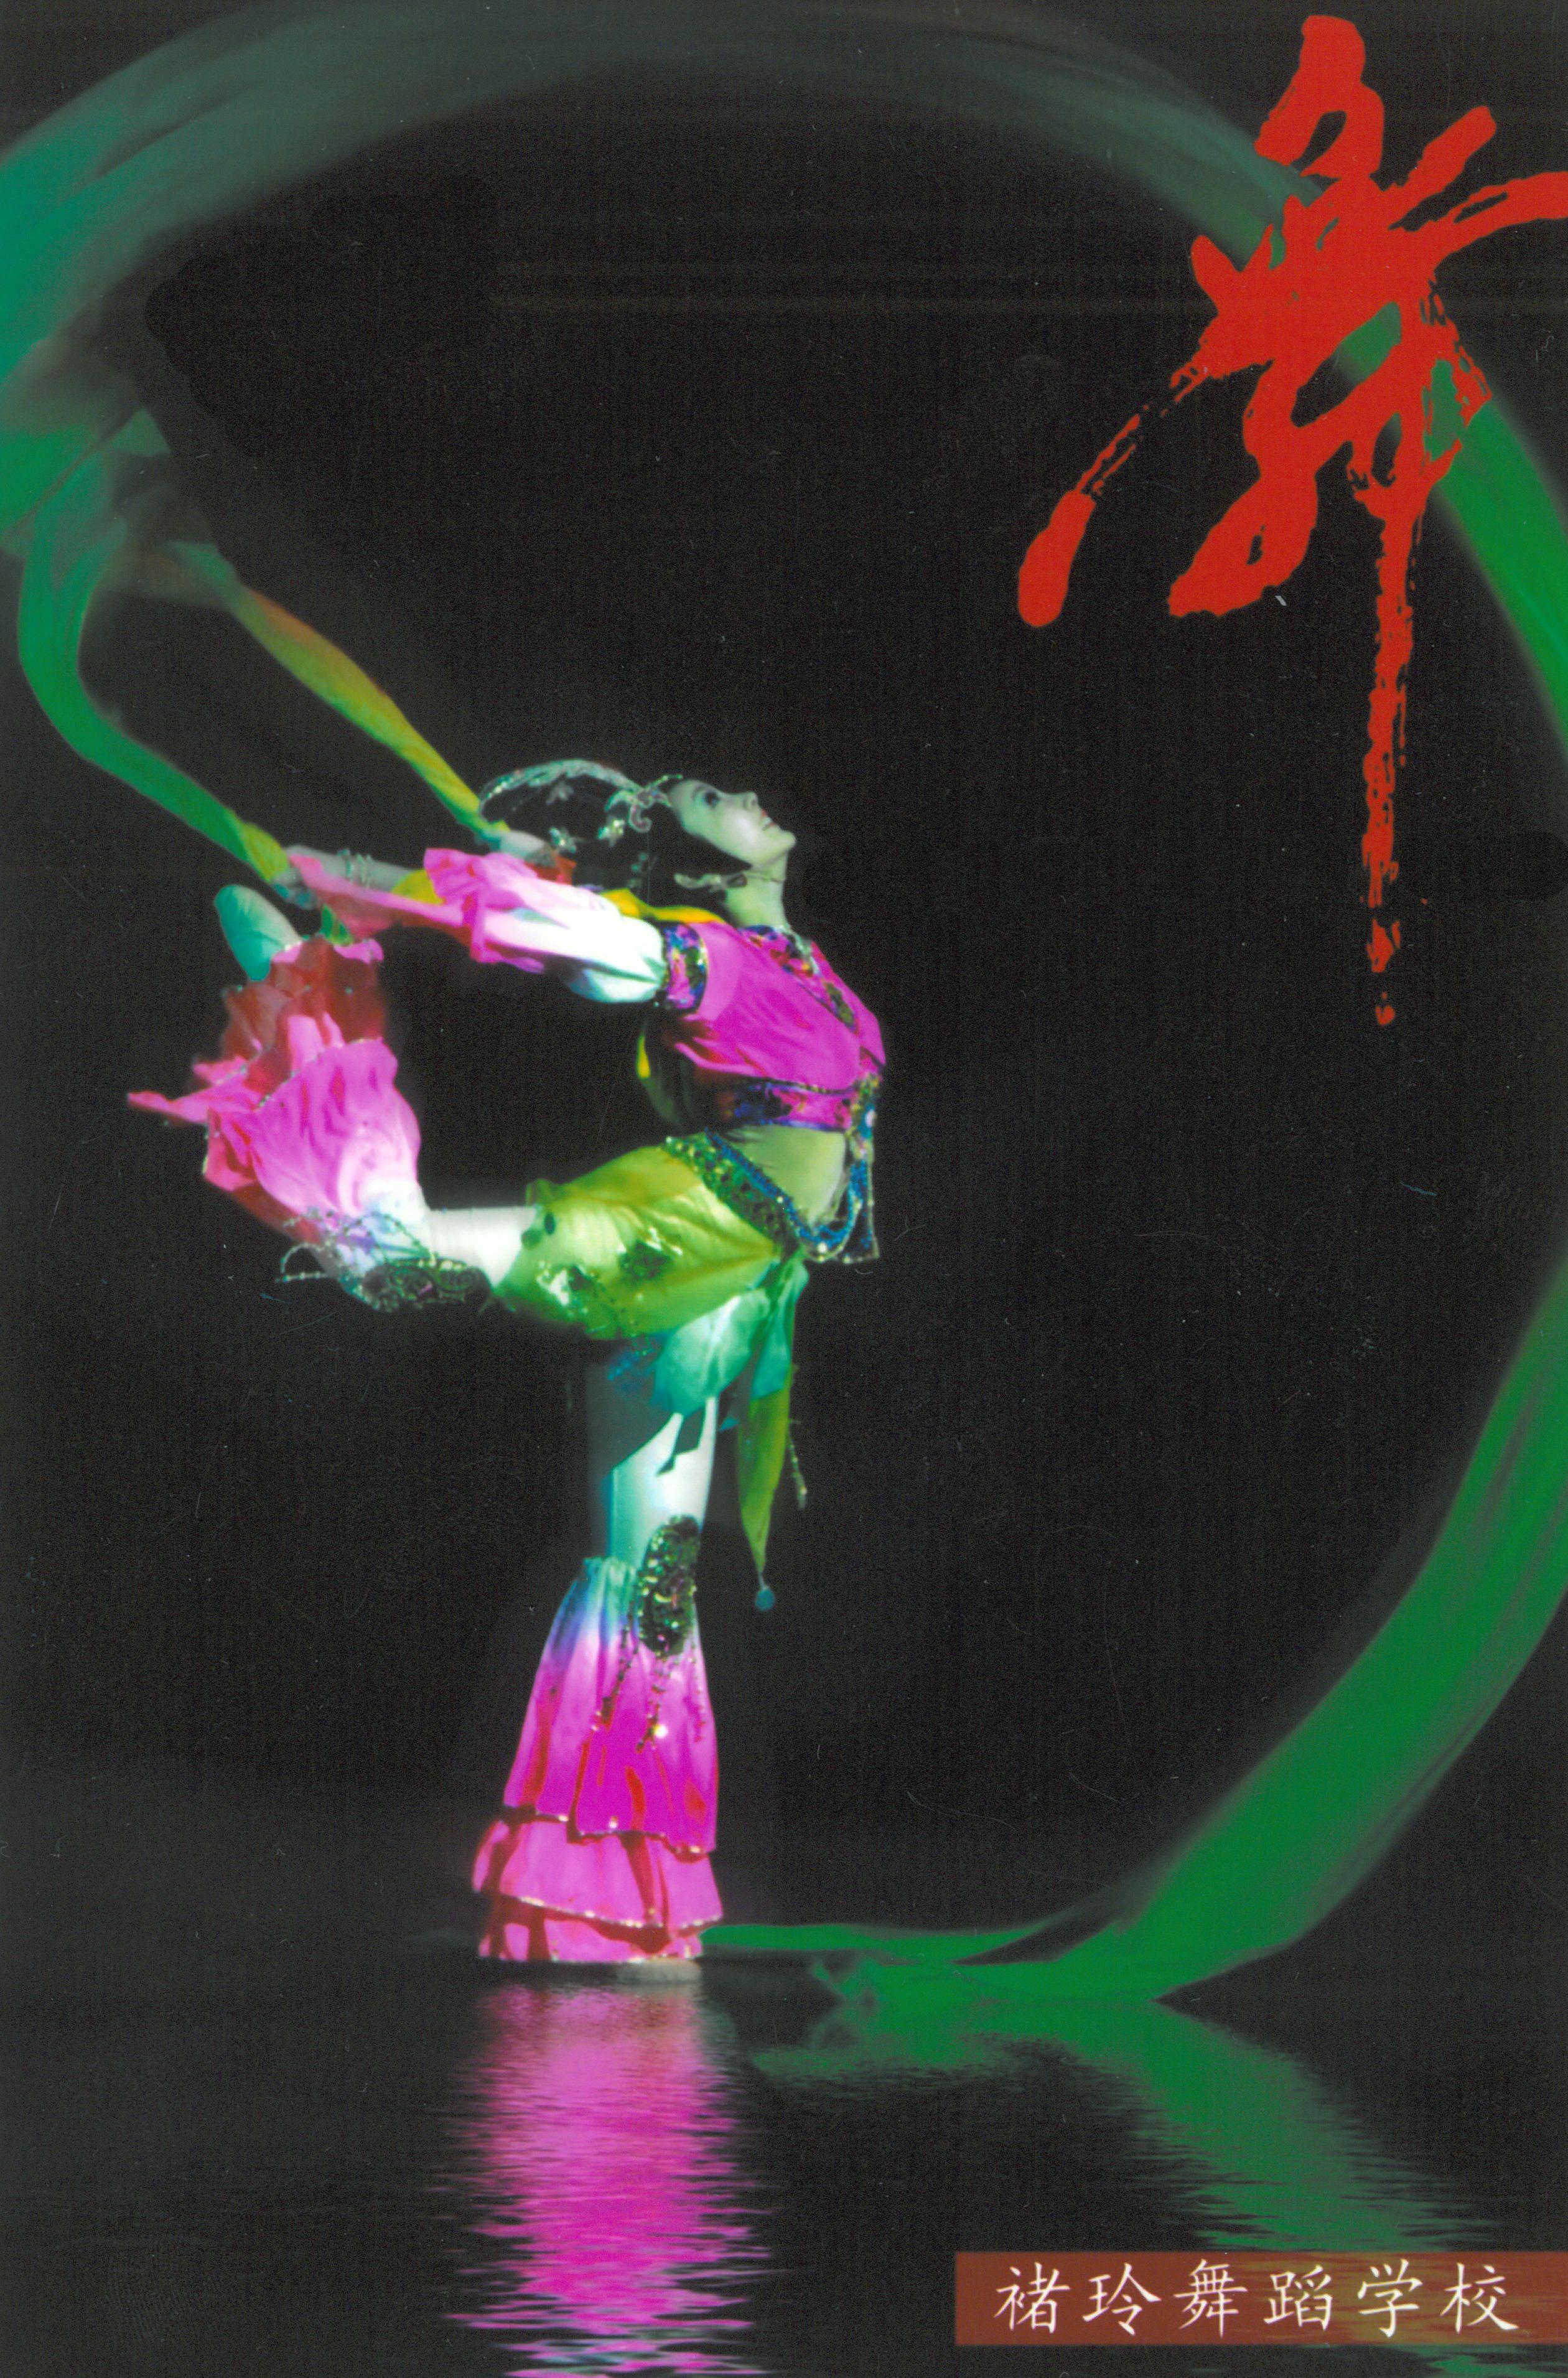 Choreograph for Solo Dance